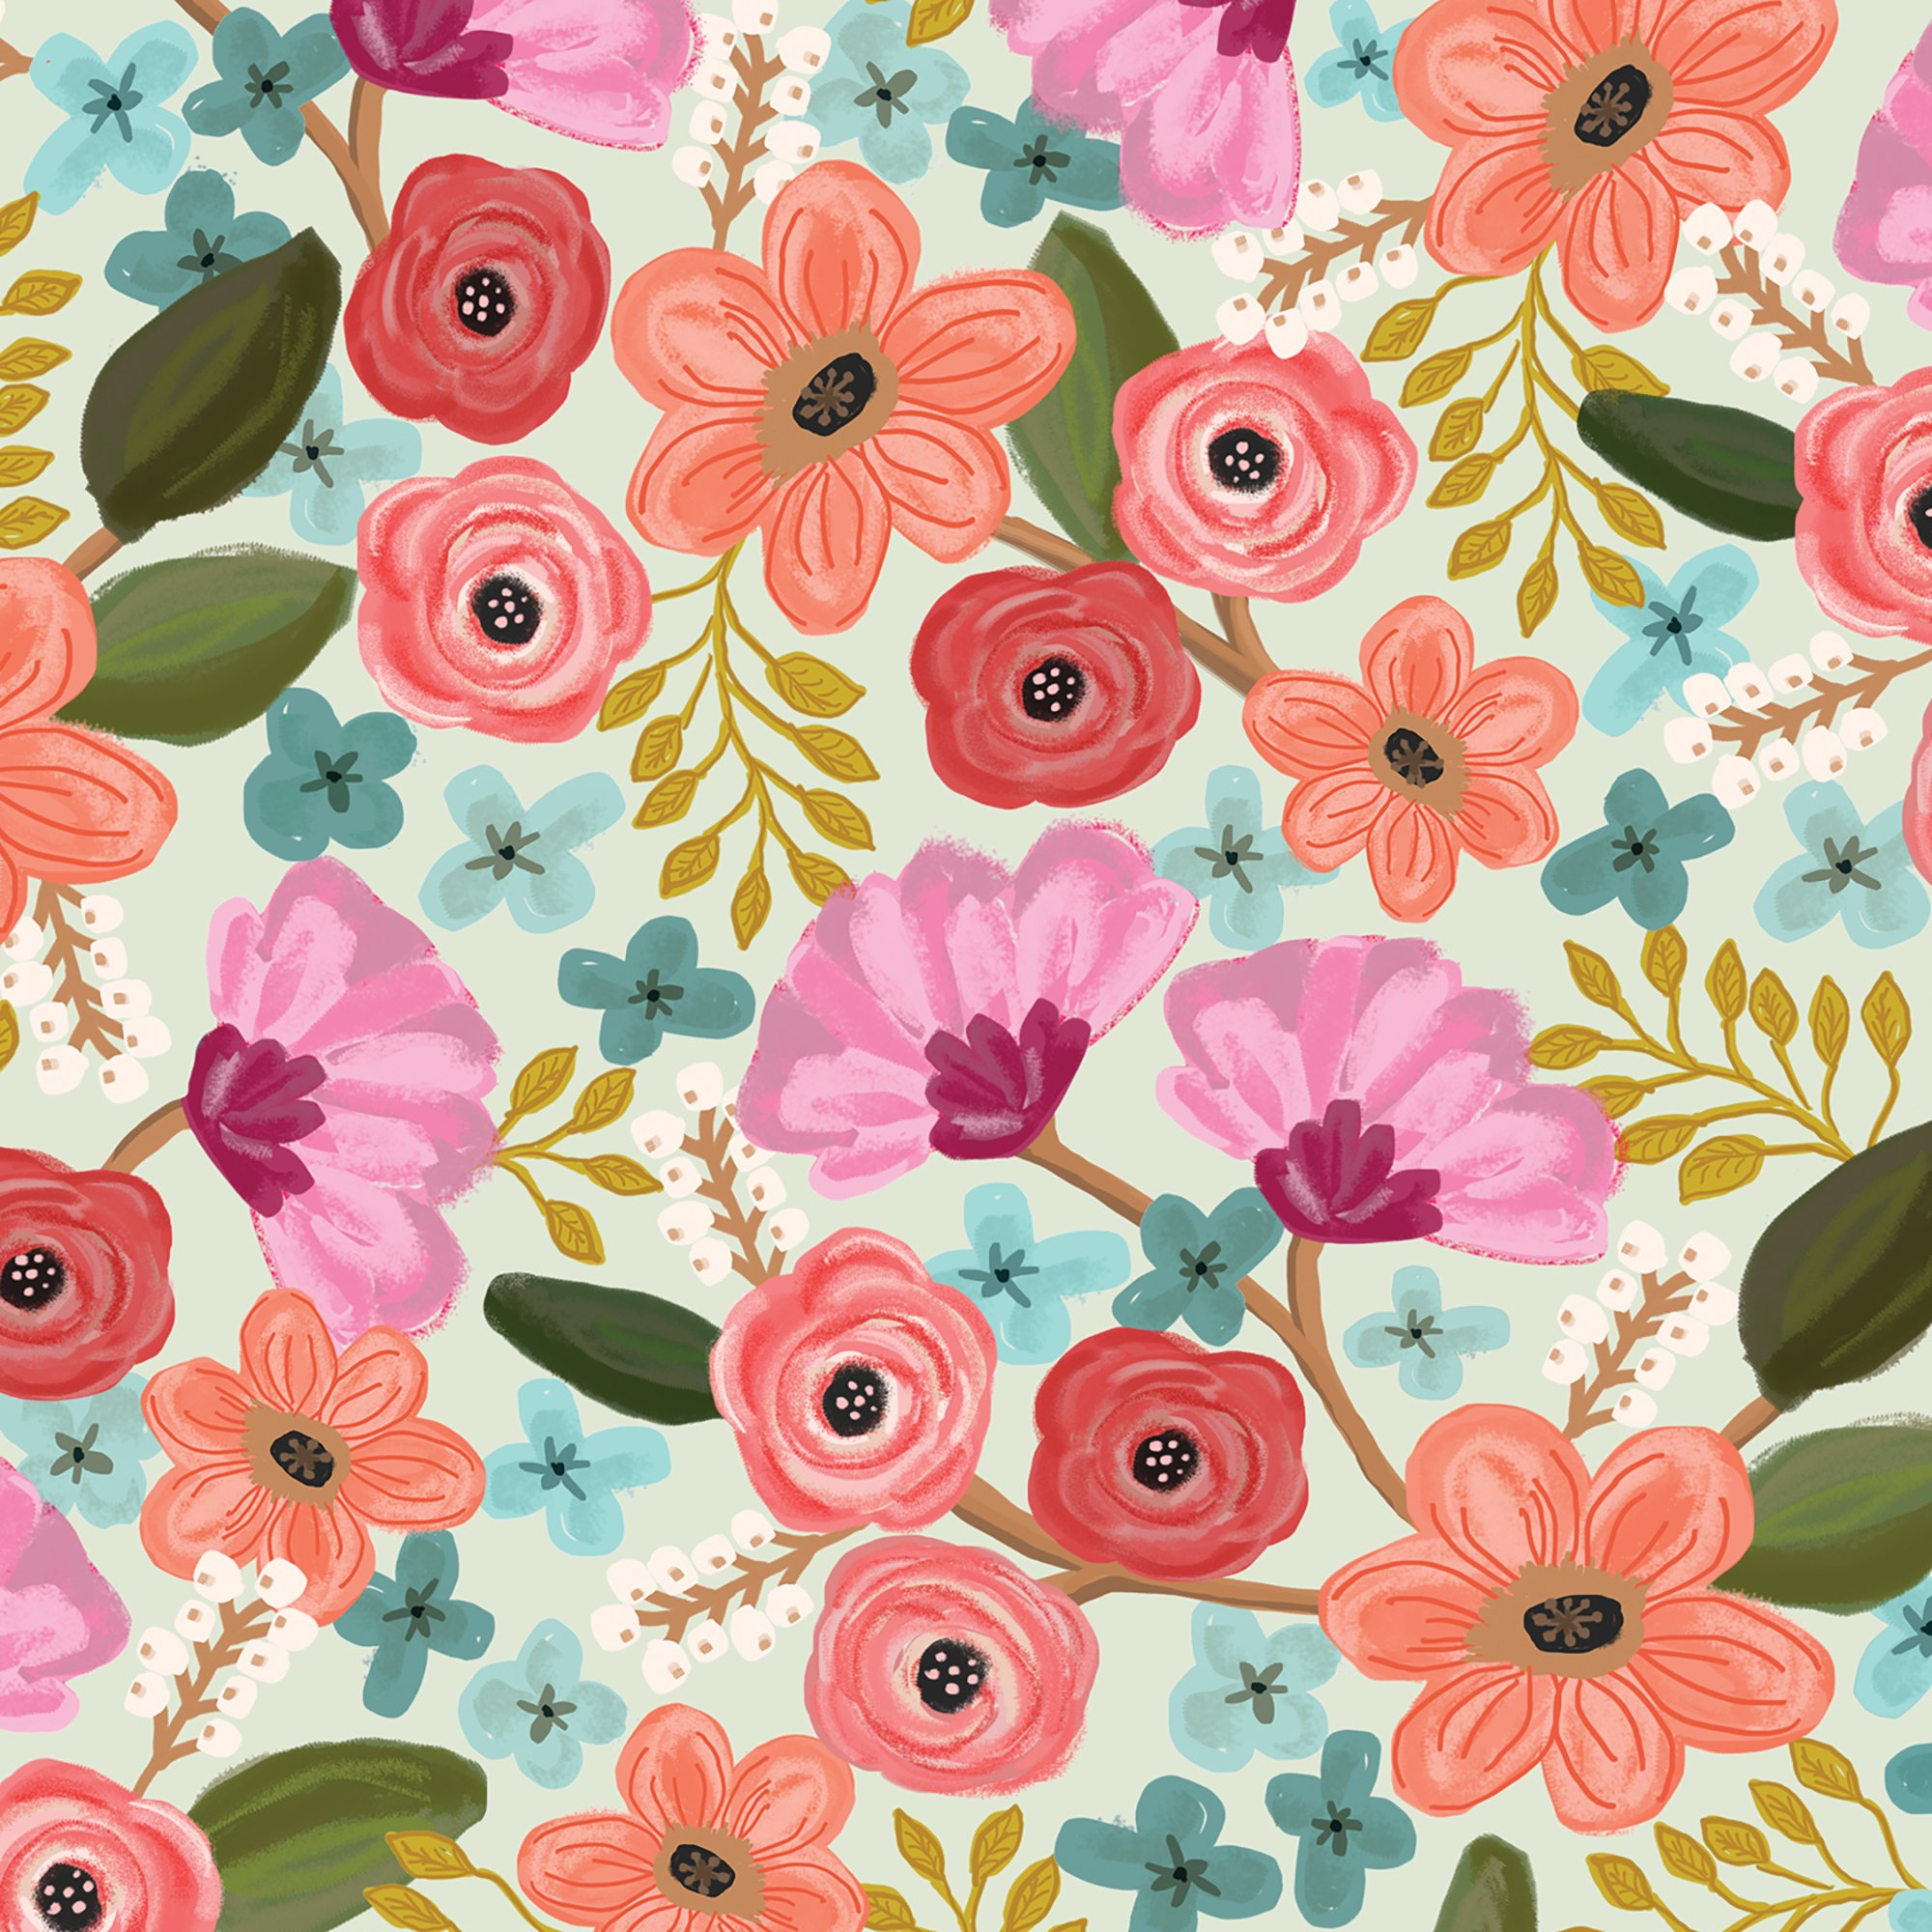 "Jillson & Roberts Bulk Gift Wrap, Gypsy Floral, 1/4 Ream 208' x 30"""